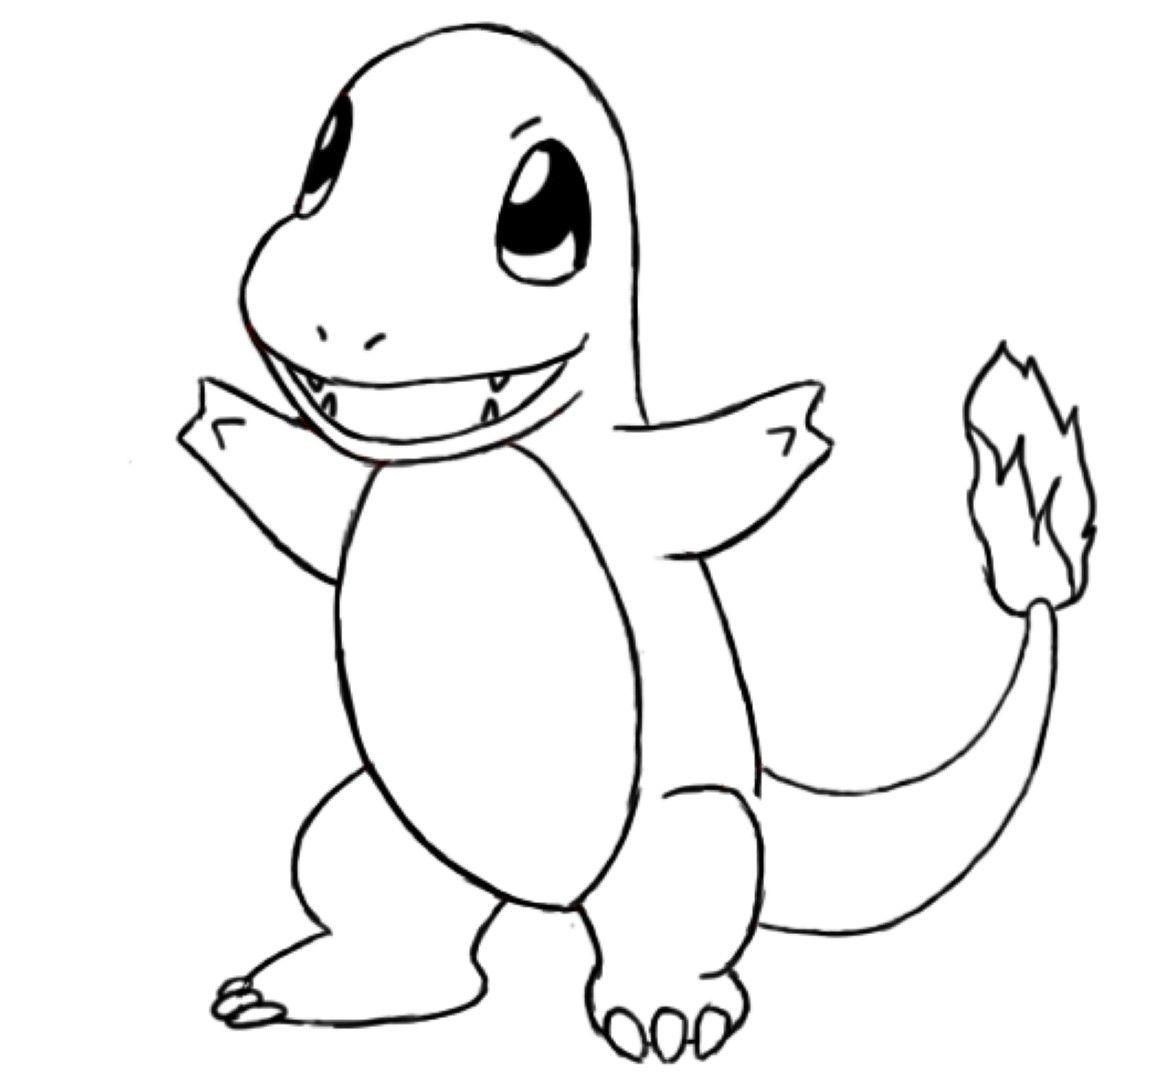 pokemon charmander coloring pages pokemon coloring pages join your favorite pokemon on an pages charmander pokemon coloring